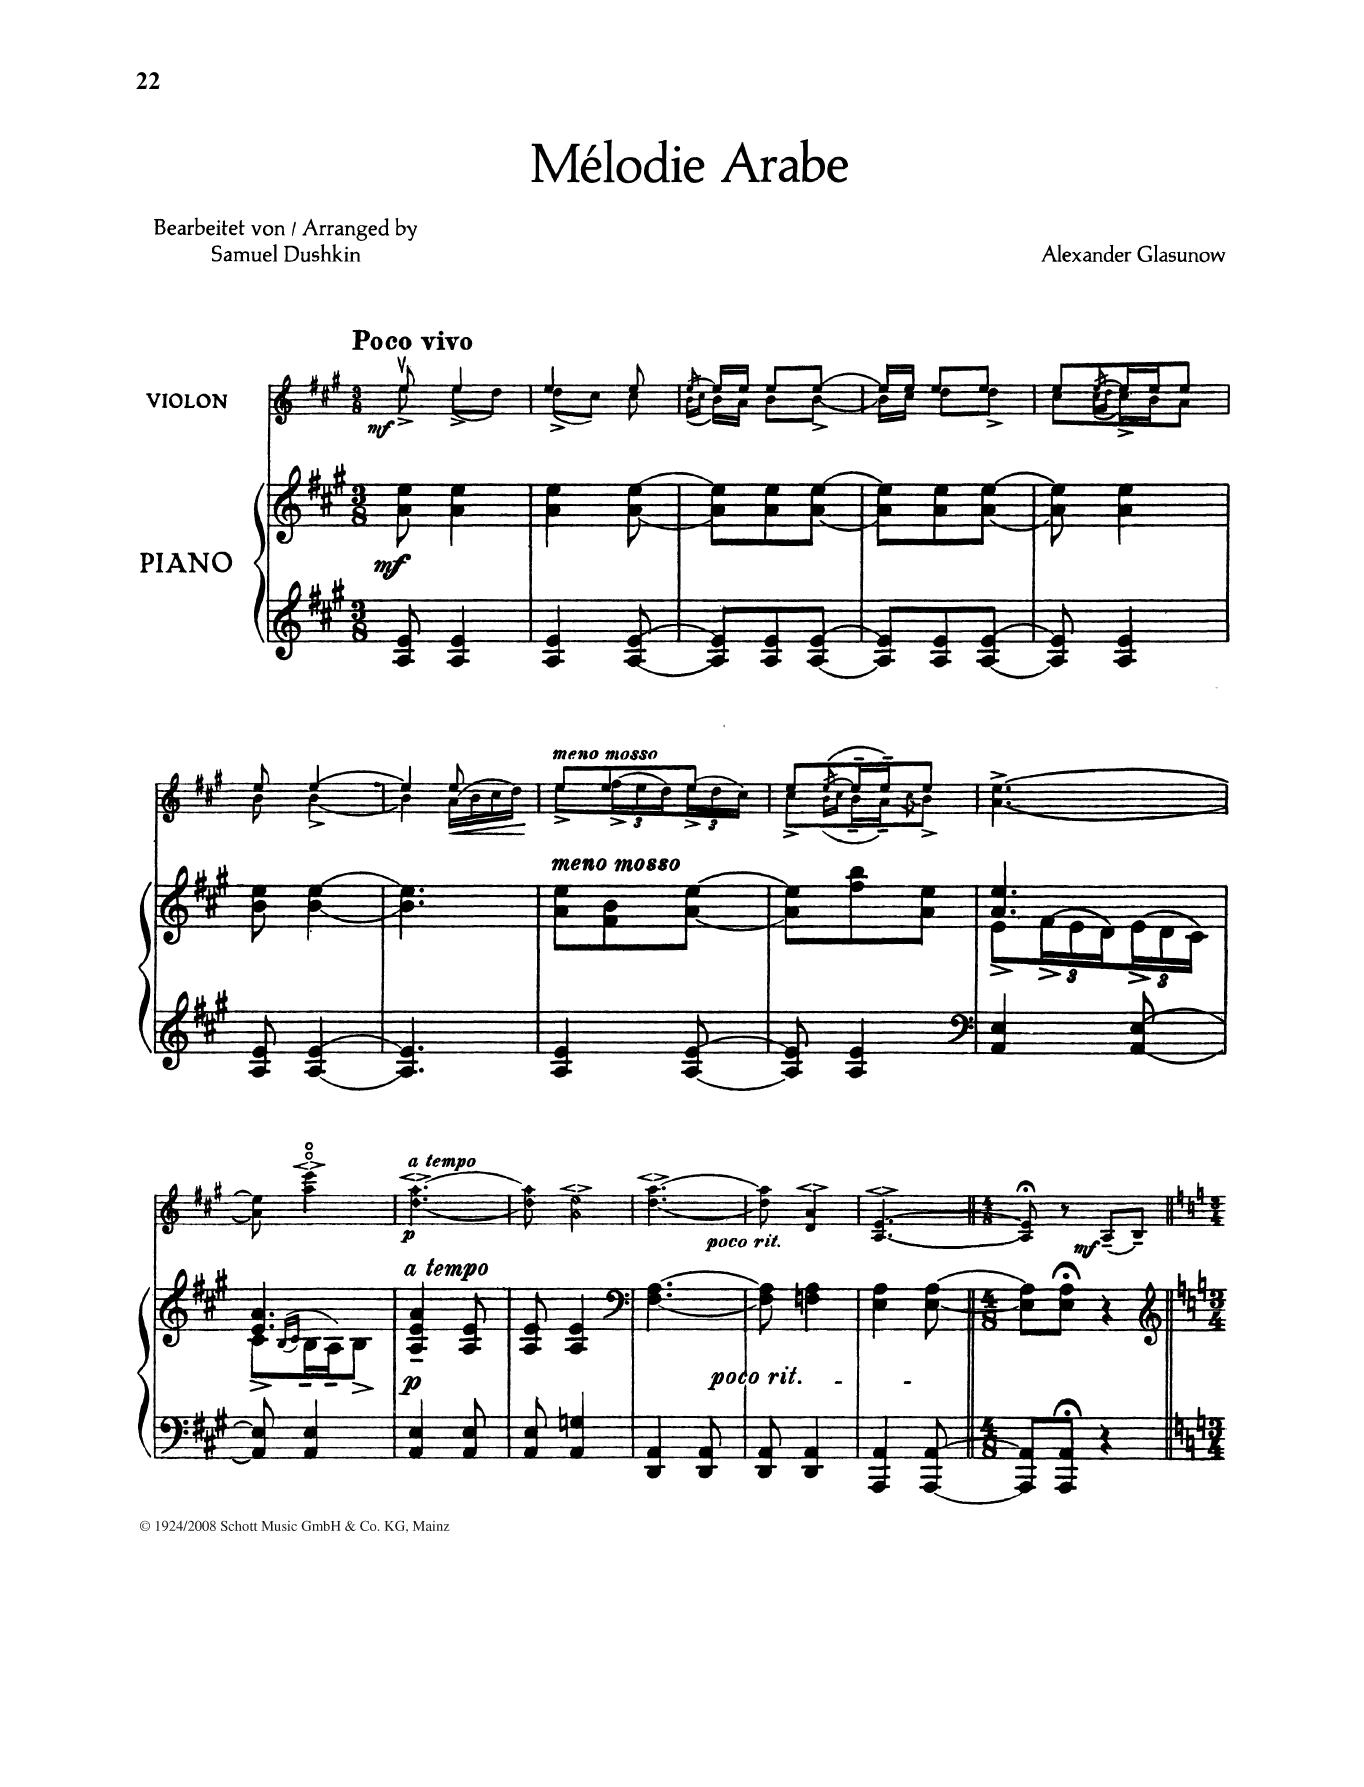 Melodie Arabe